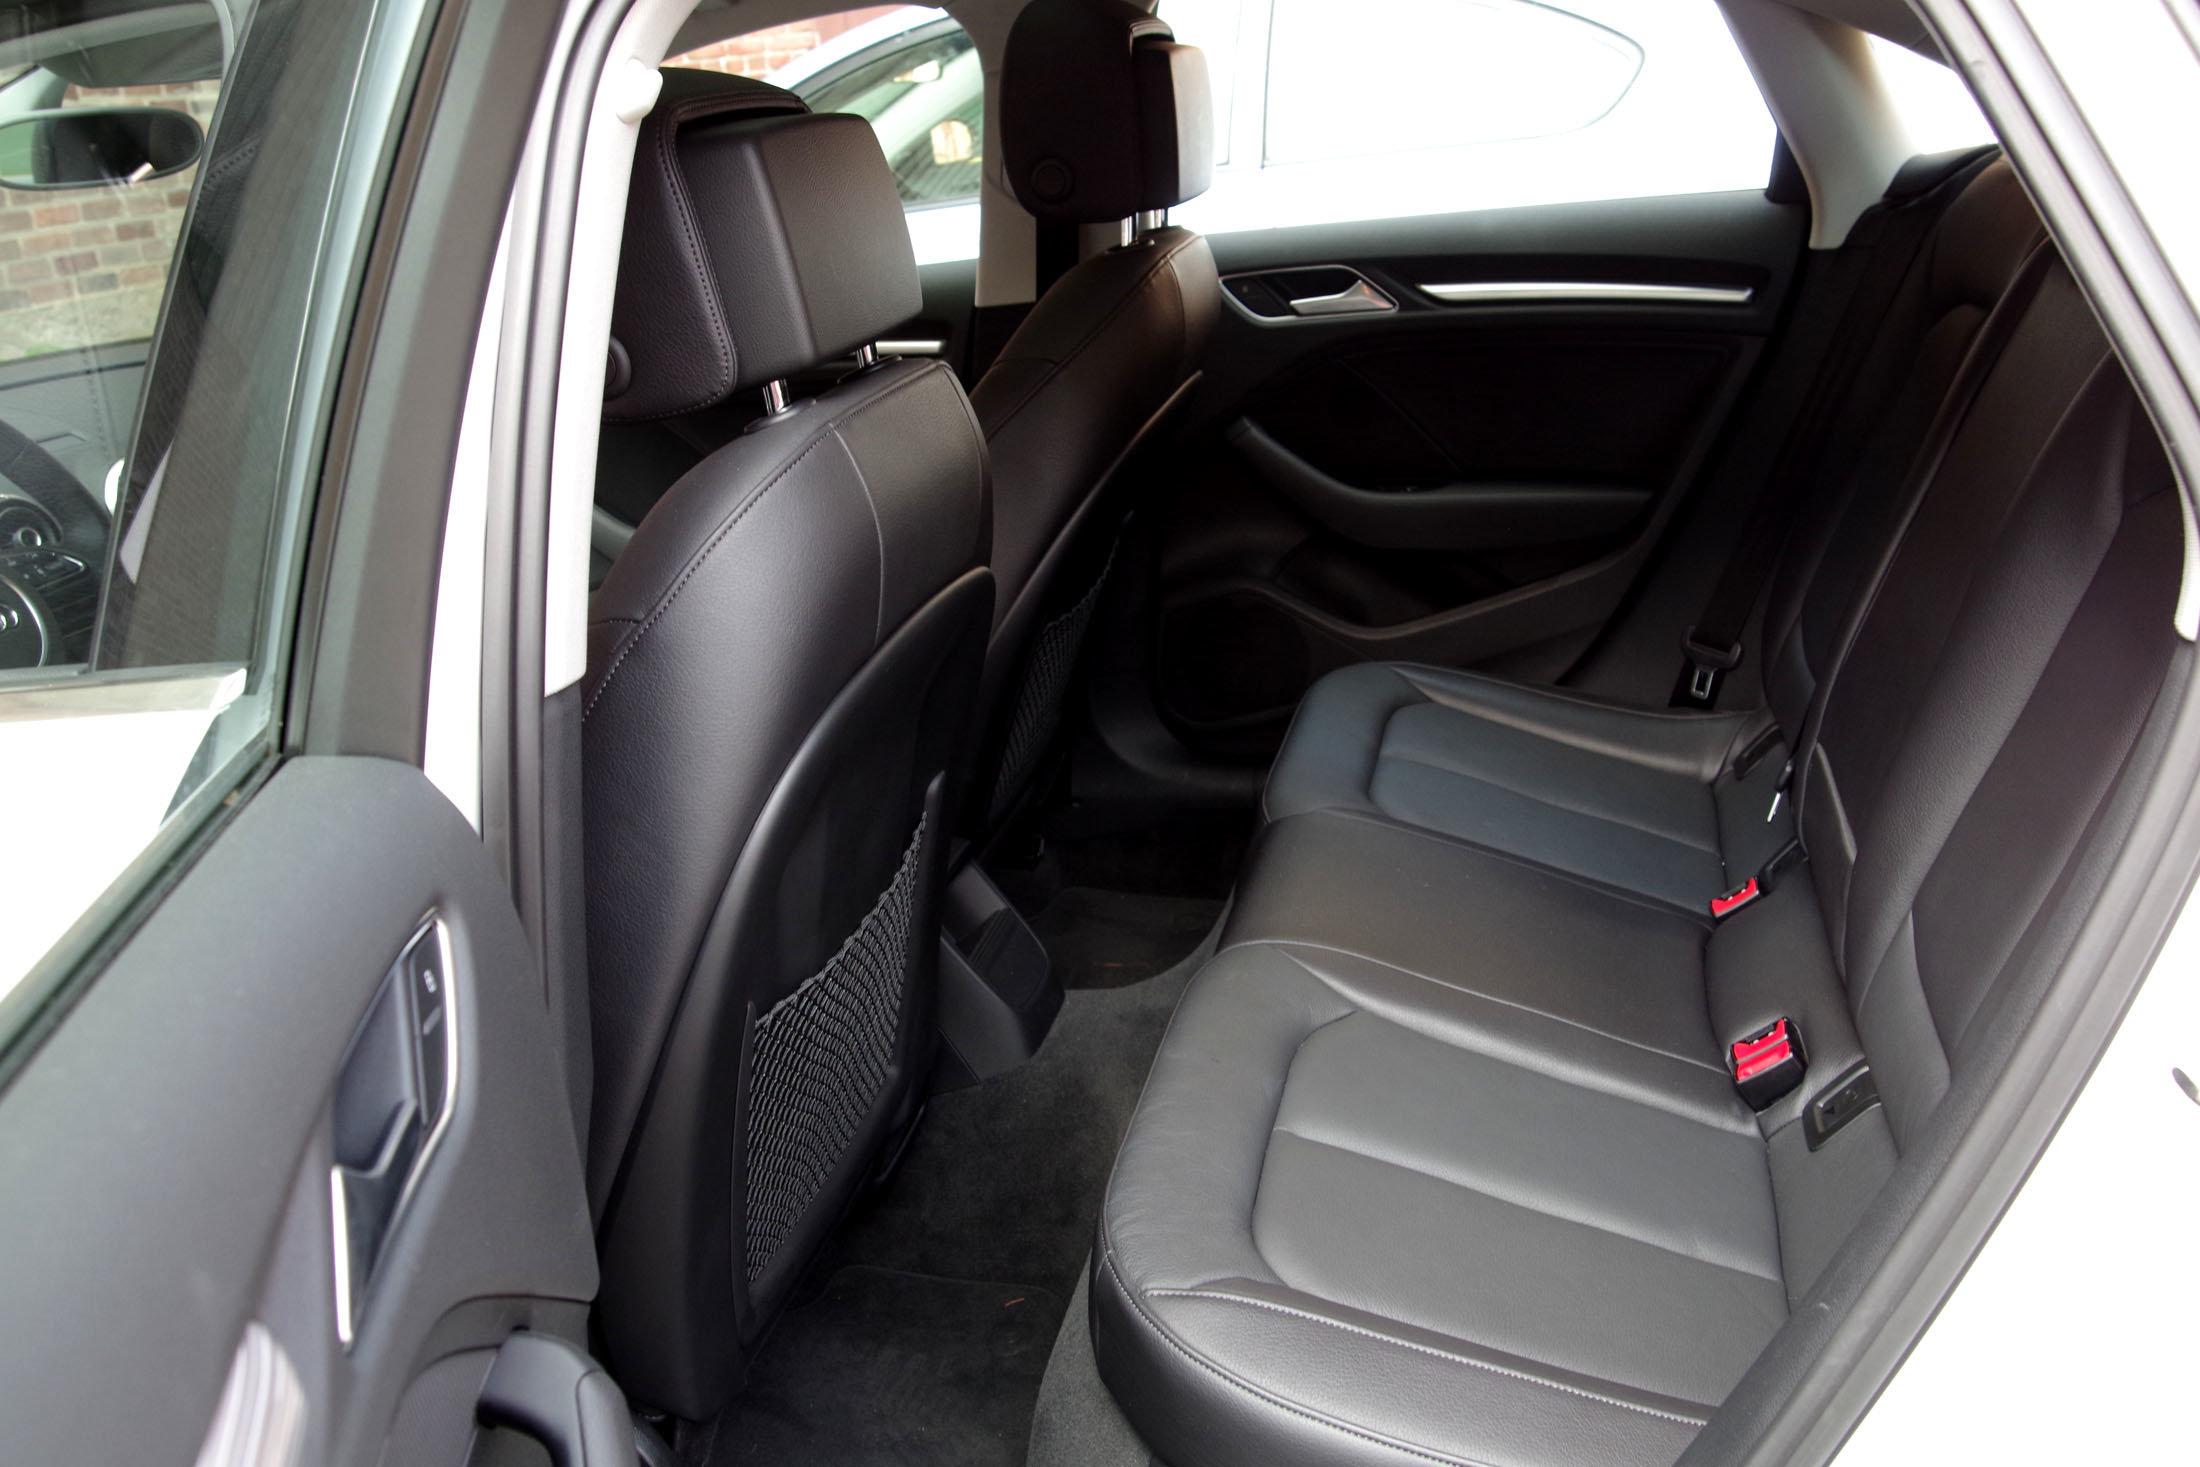 2015 audi a3 backseat